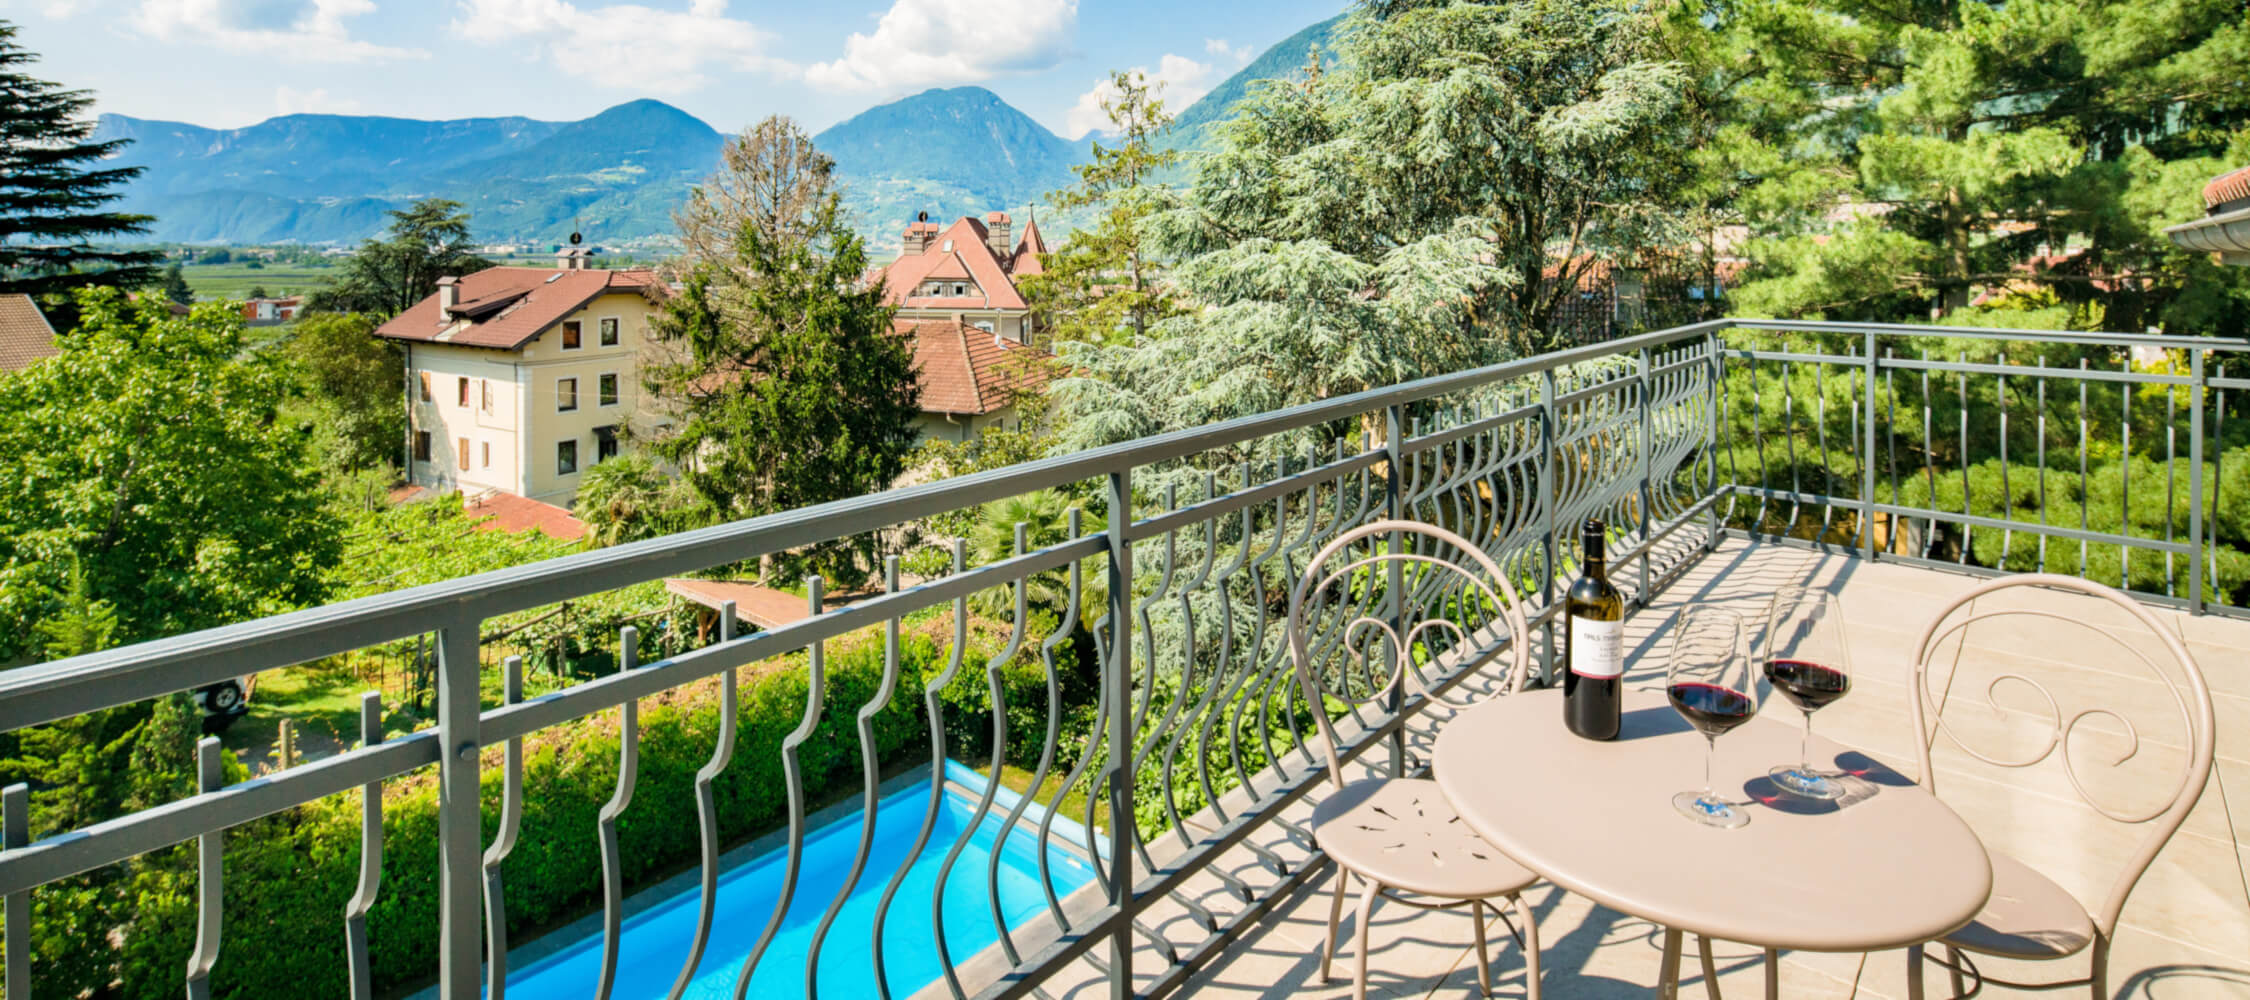 Hotel-Villa-Laurus-Merano-Wellness-Garten-Pool-Panorama-FlorianBusch-2-2250x1000